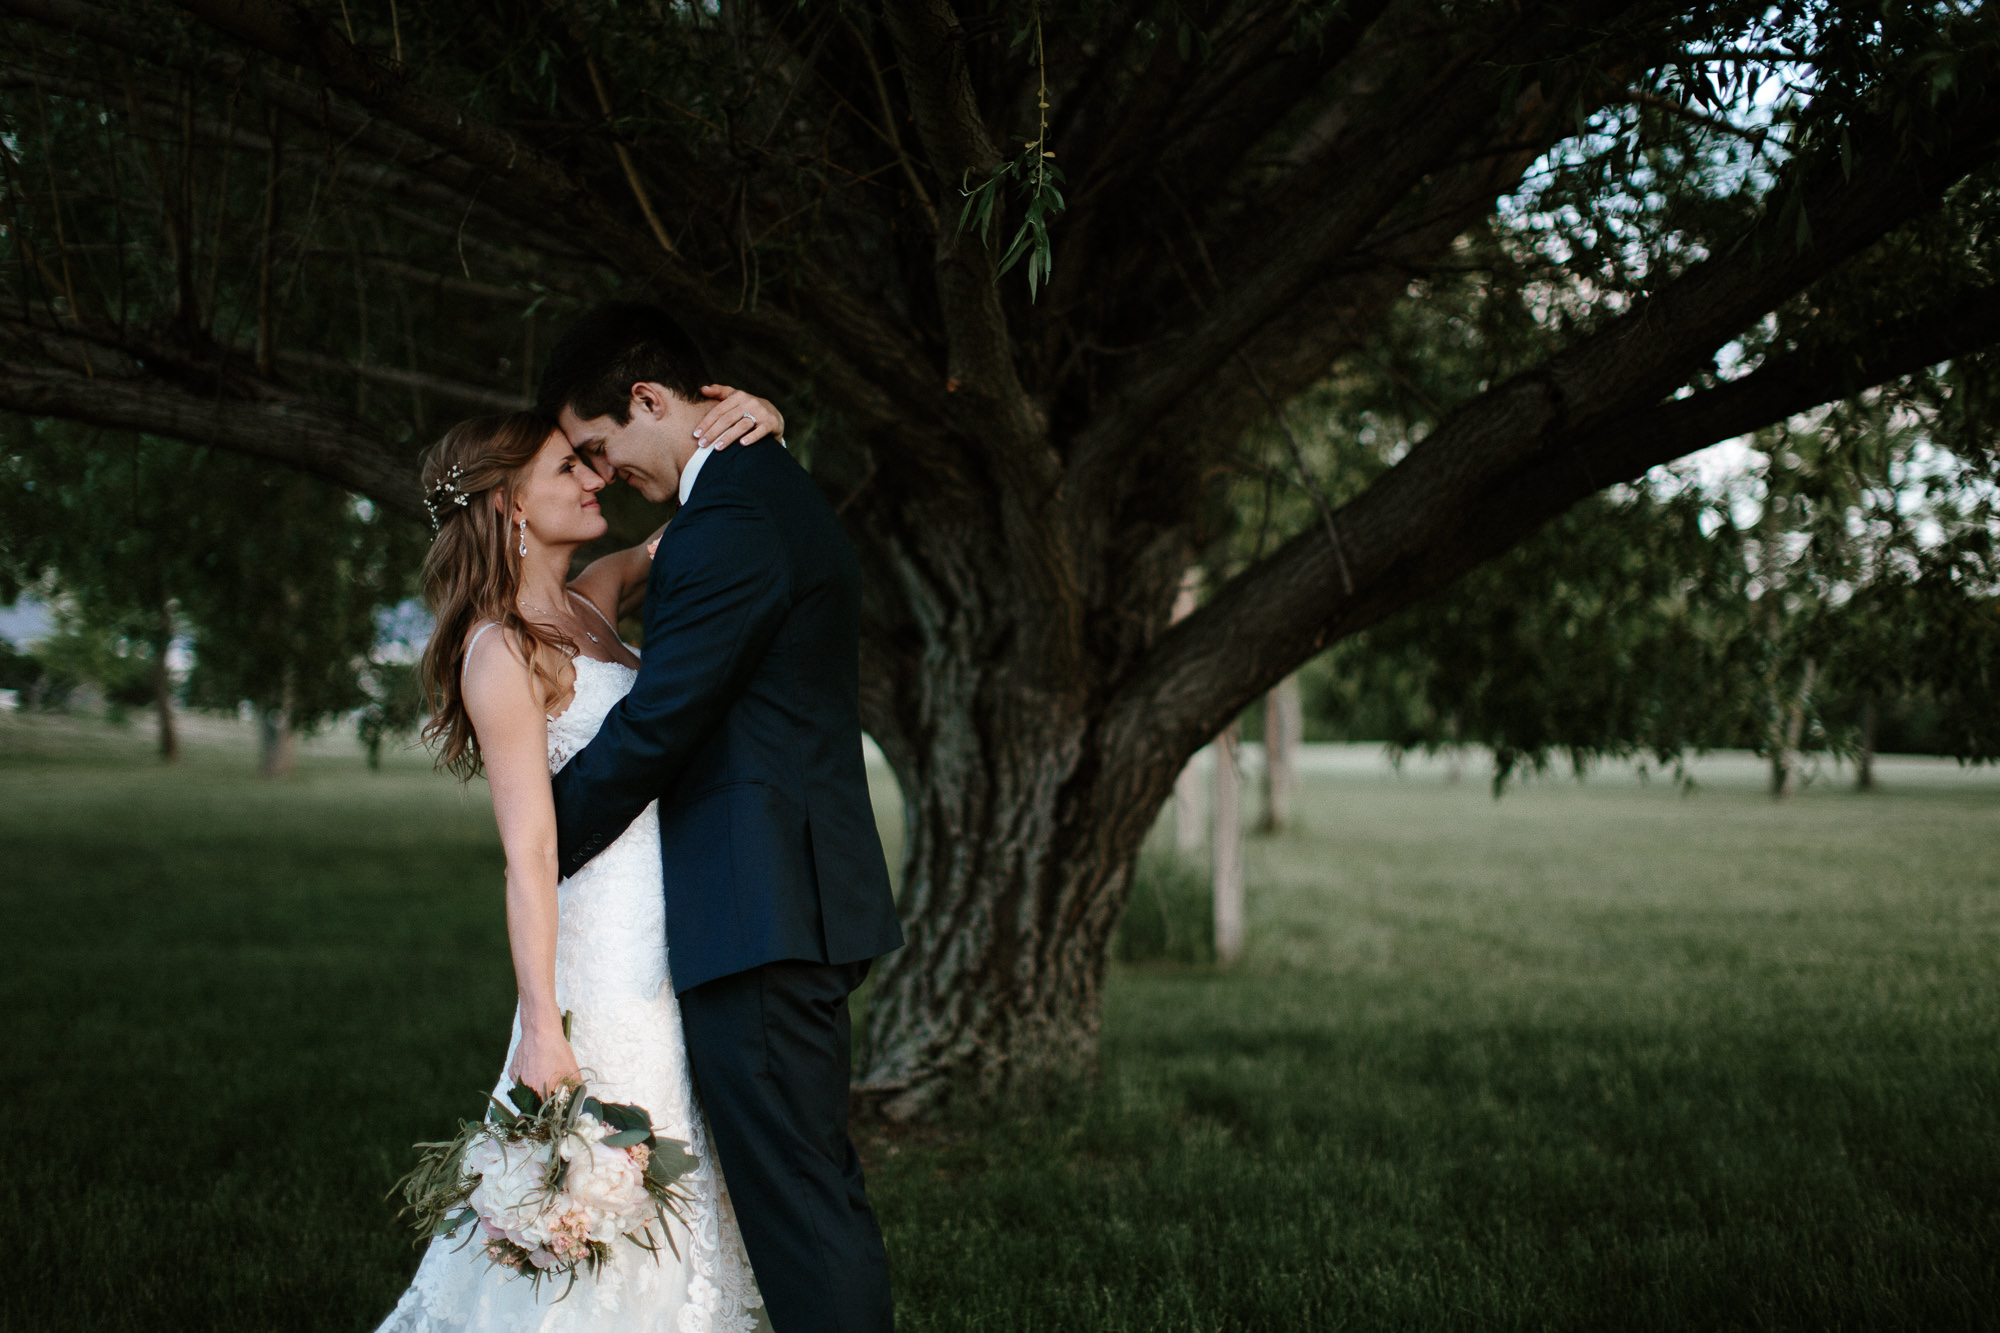 wedding-elopement-adventerous-romantic-timeless-south-dakota-blue-haven-barn-088.jpg